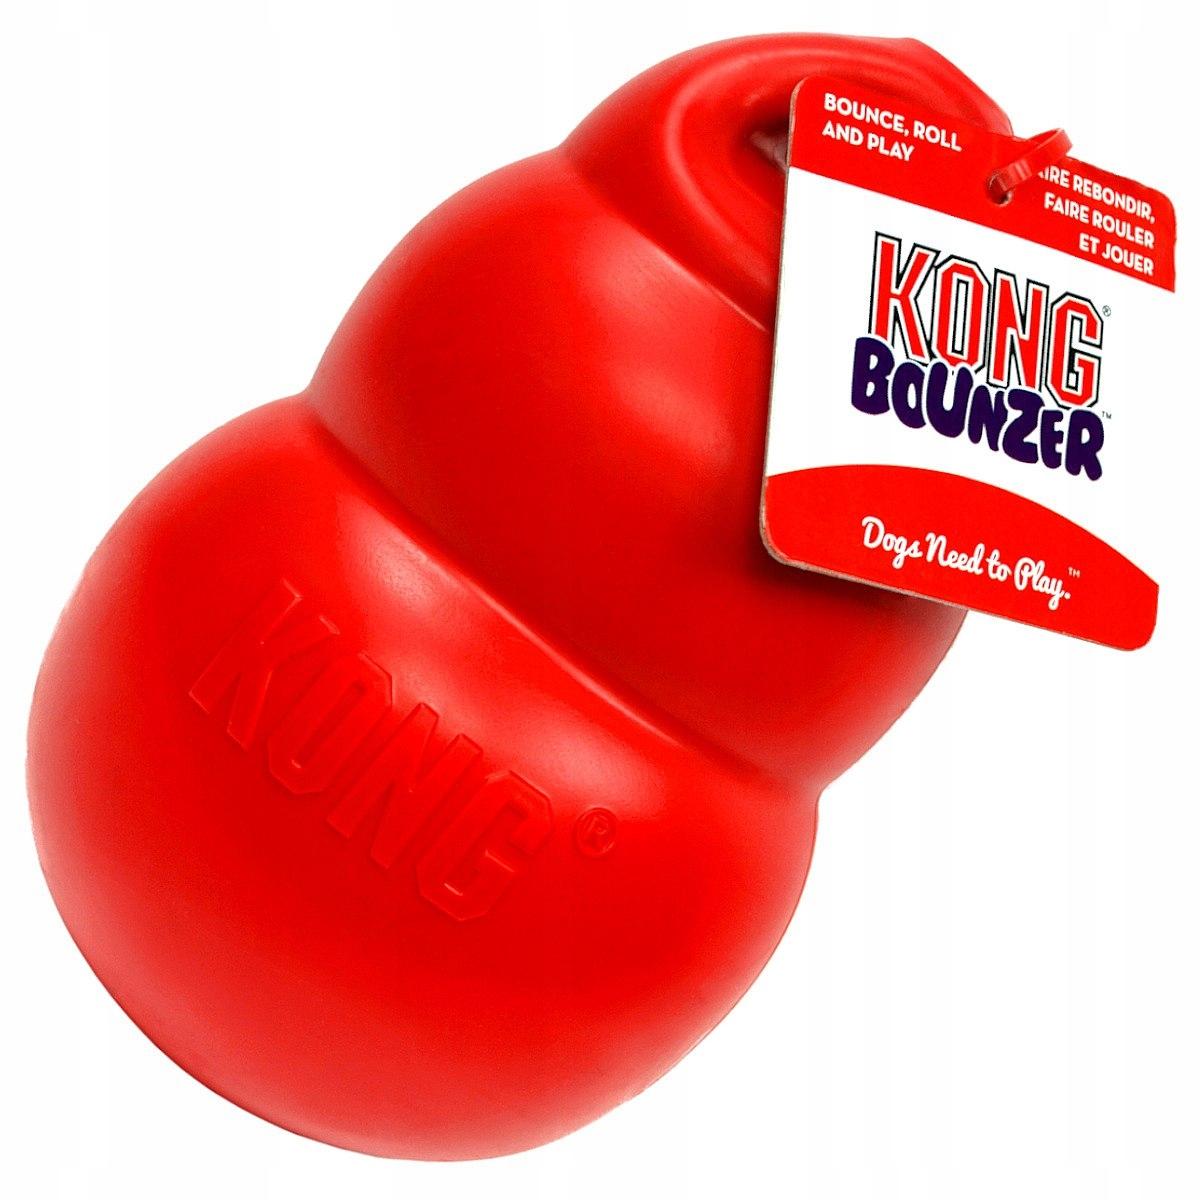 Mocna Solidna zabawka KONG Bounzer dla PSA psów